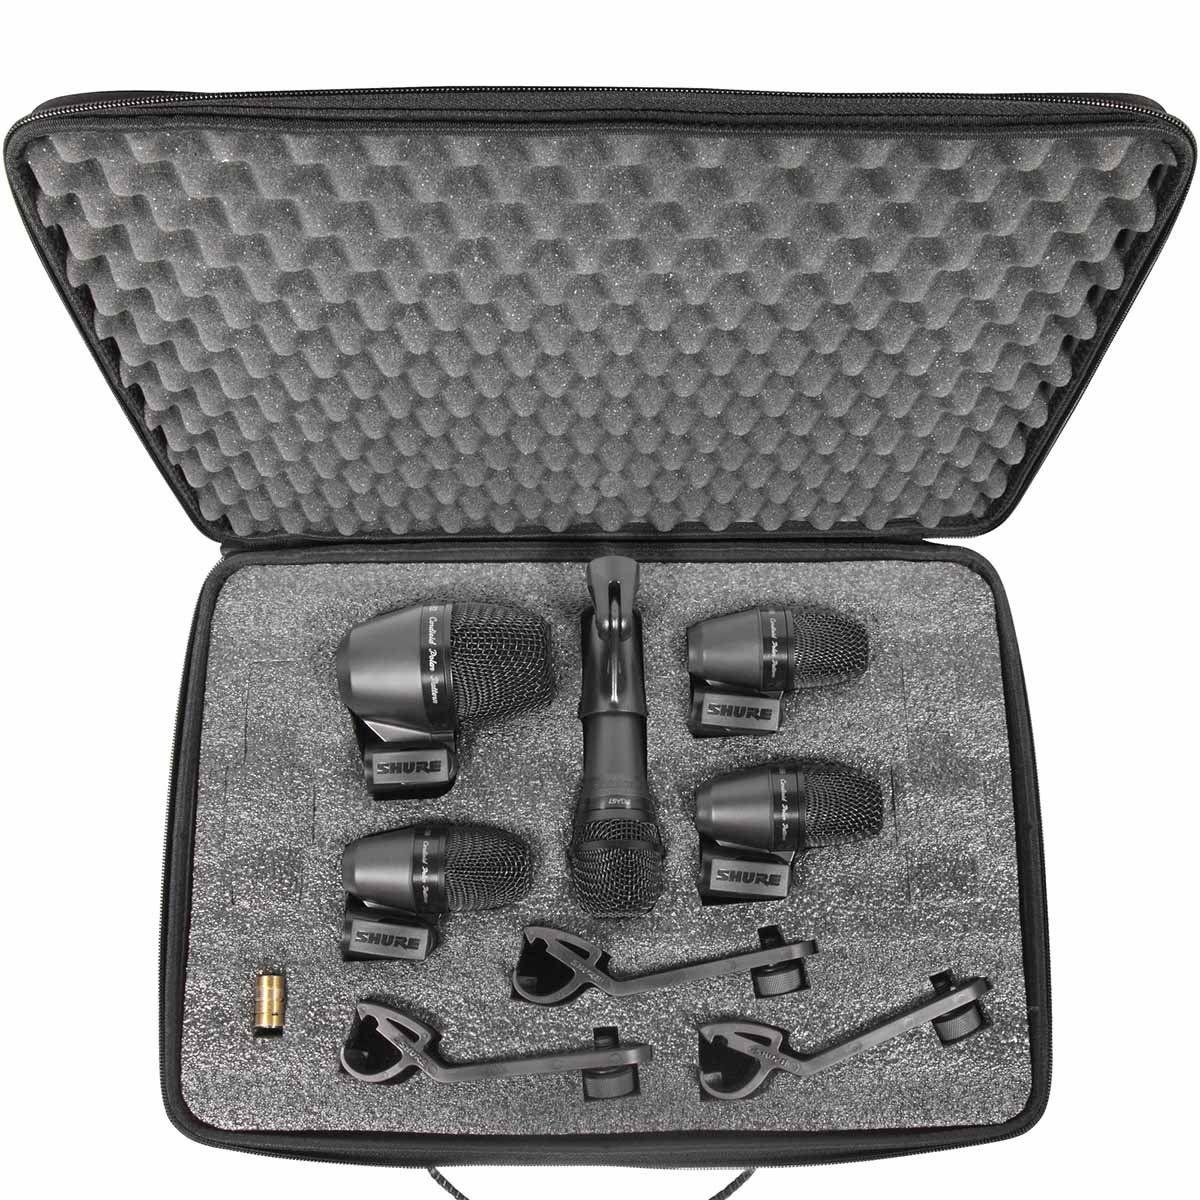 Shure PGADRUMKIT5 Microfones Dinâmicos Kit de Microfones para Bateria Drum Kit 5